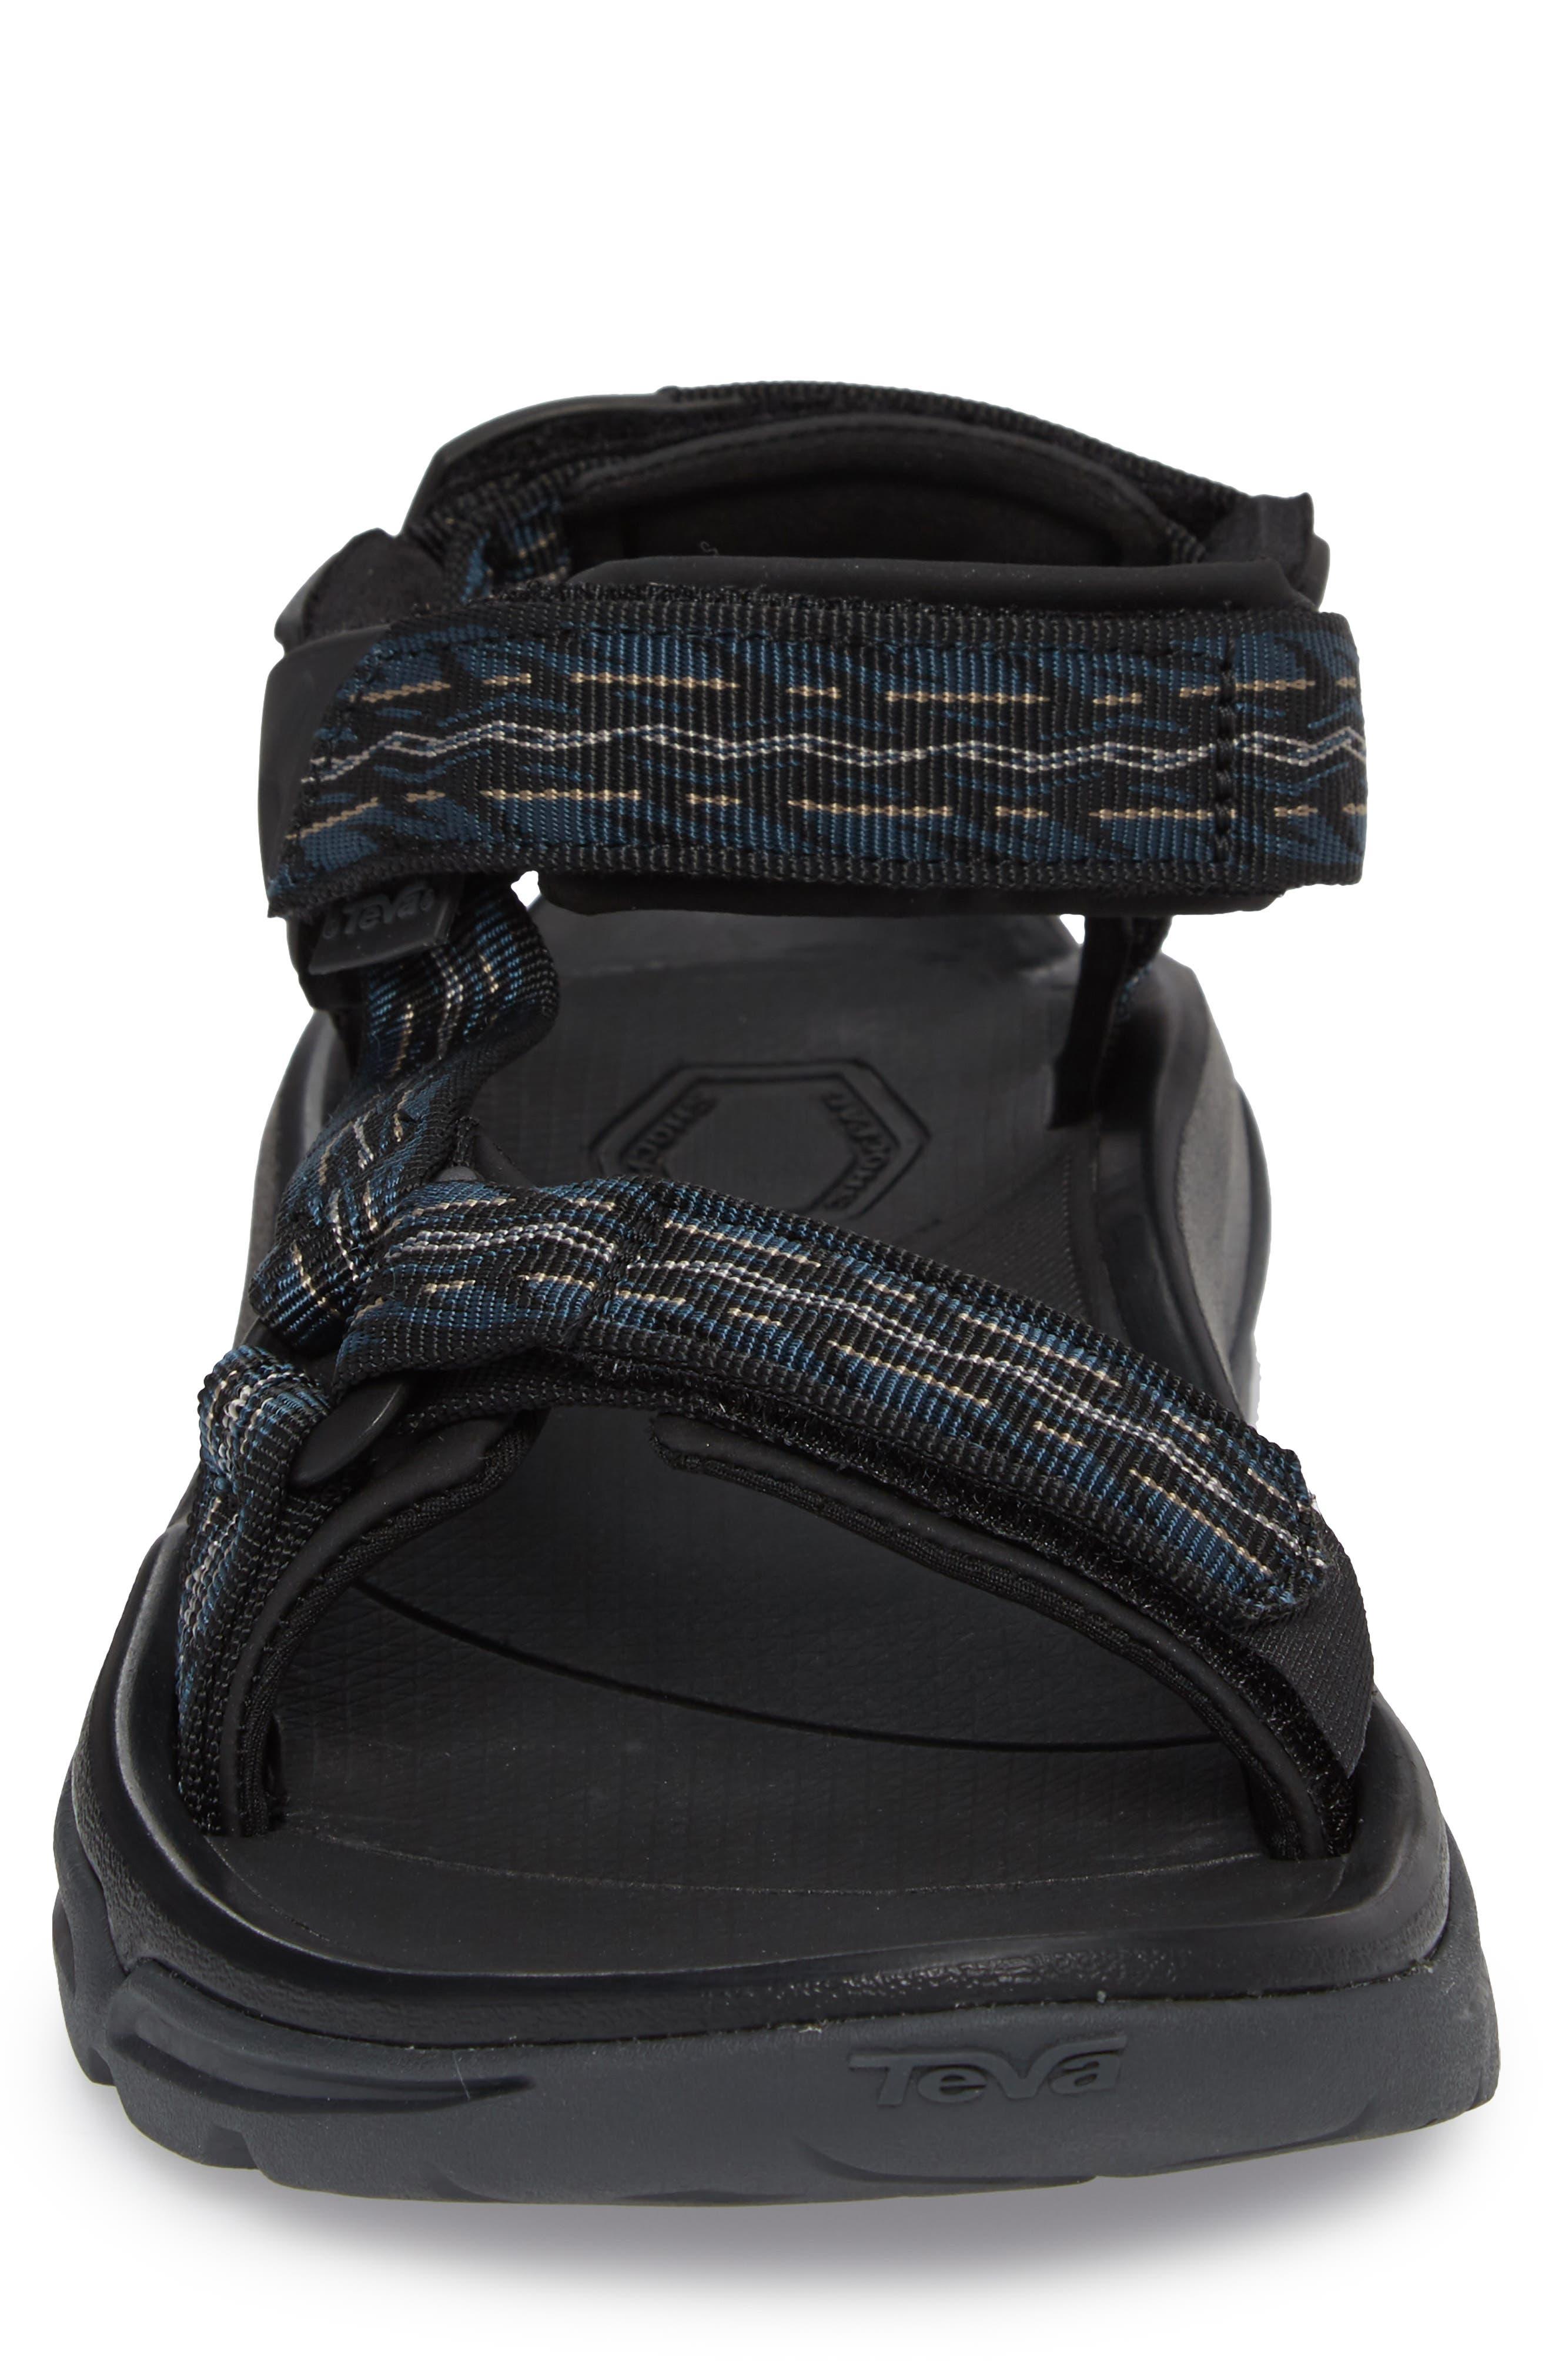 Terra Fi 4 Sport Sandal,                             Alternate thumbnail 4, color,                             Midnight Blue Nylon